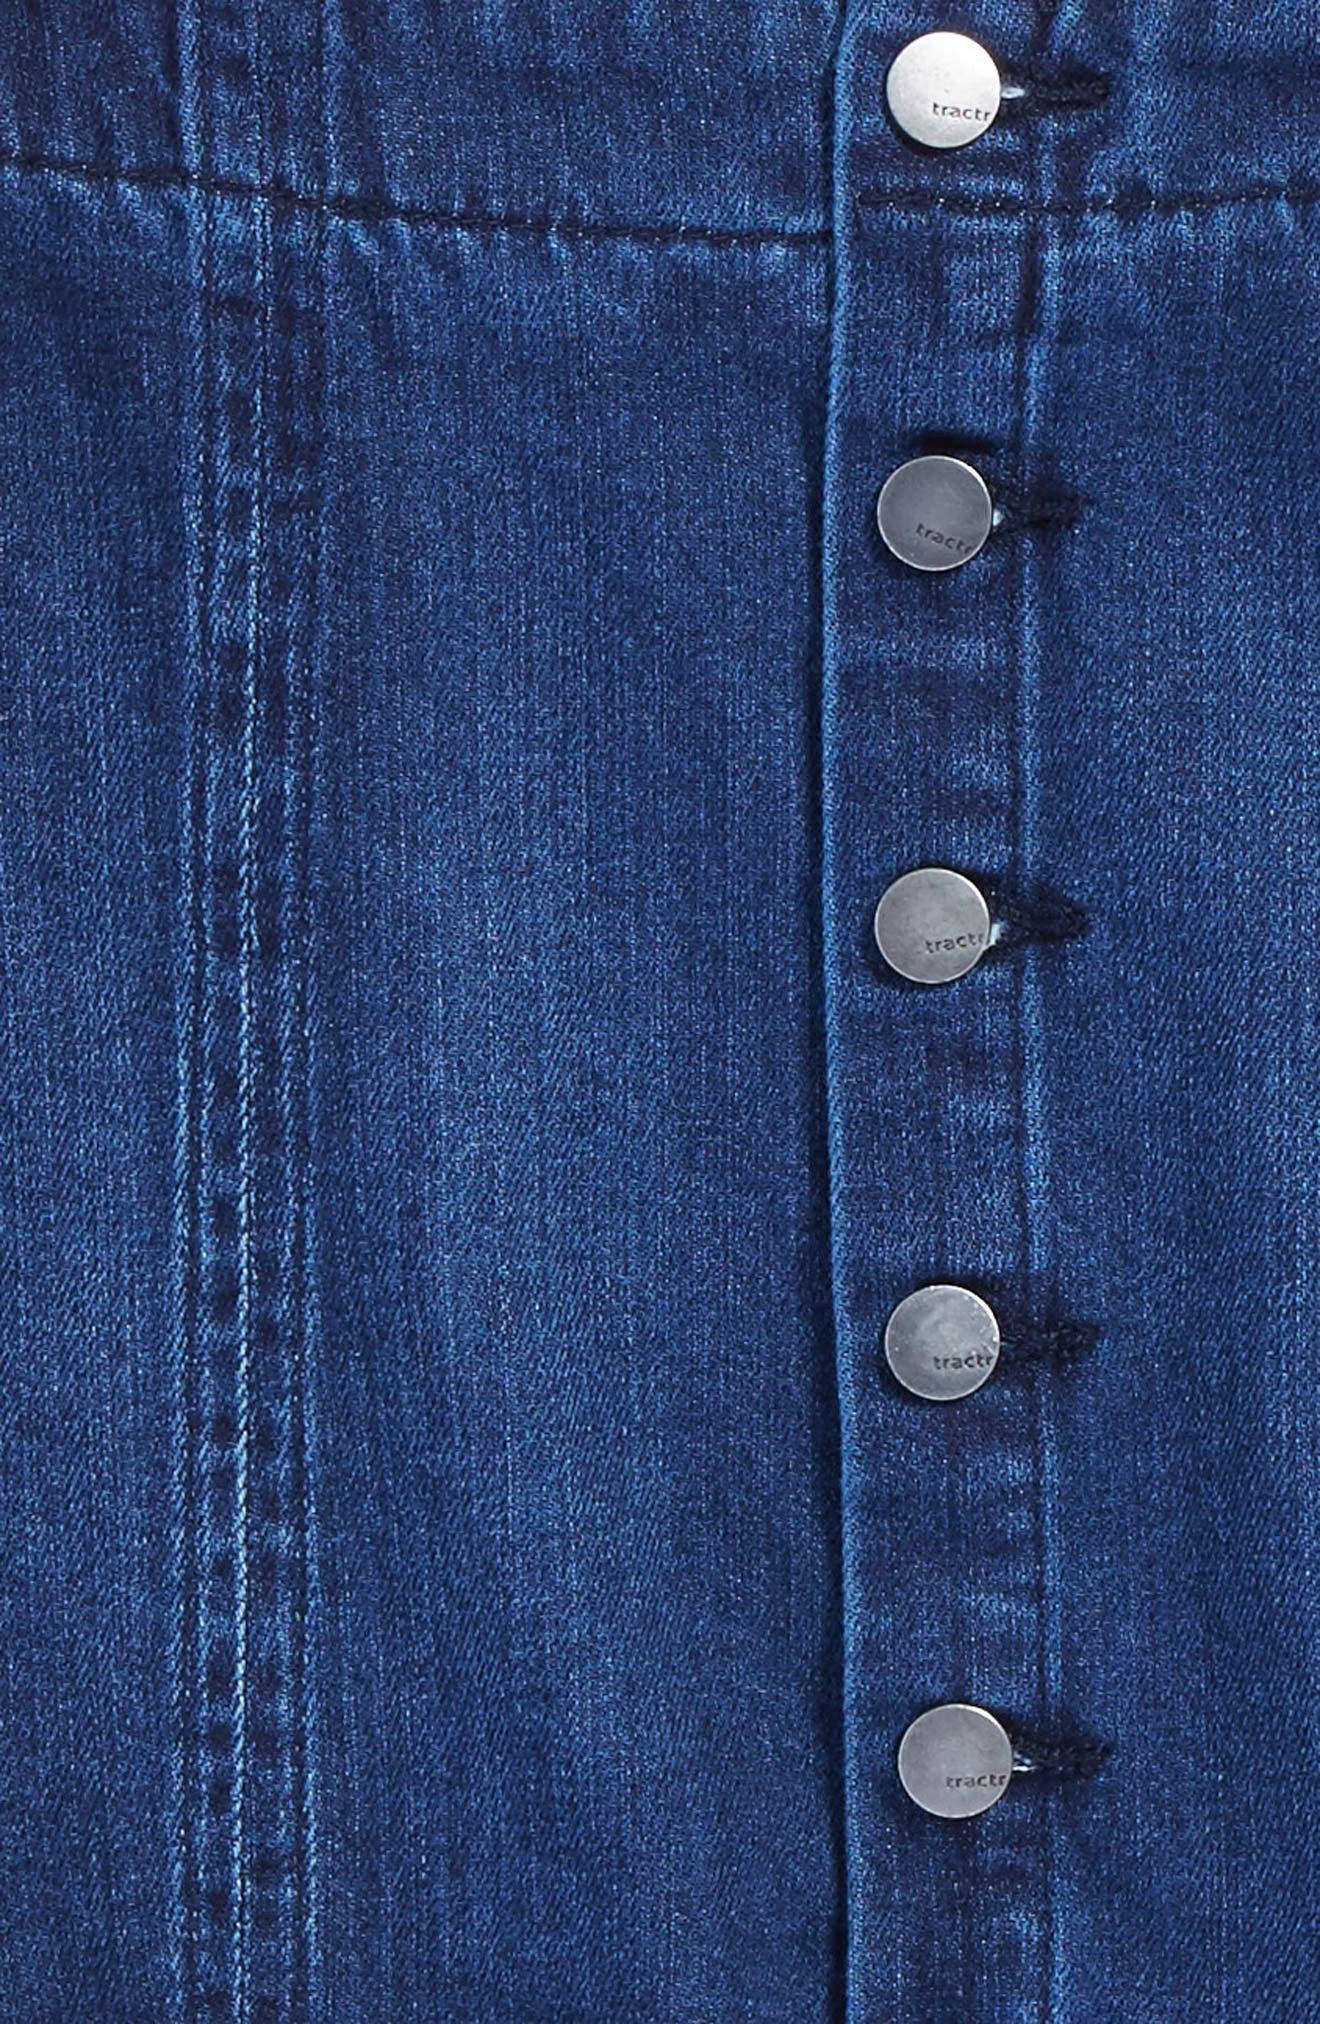 Frayed Scallop Denim Skirt,                             Alternate thumbnail 3, color,                             407